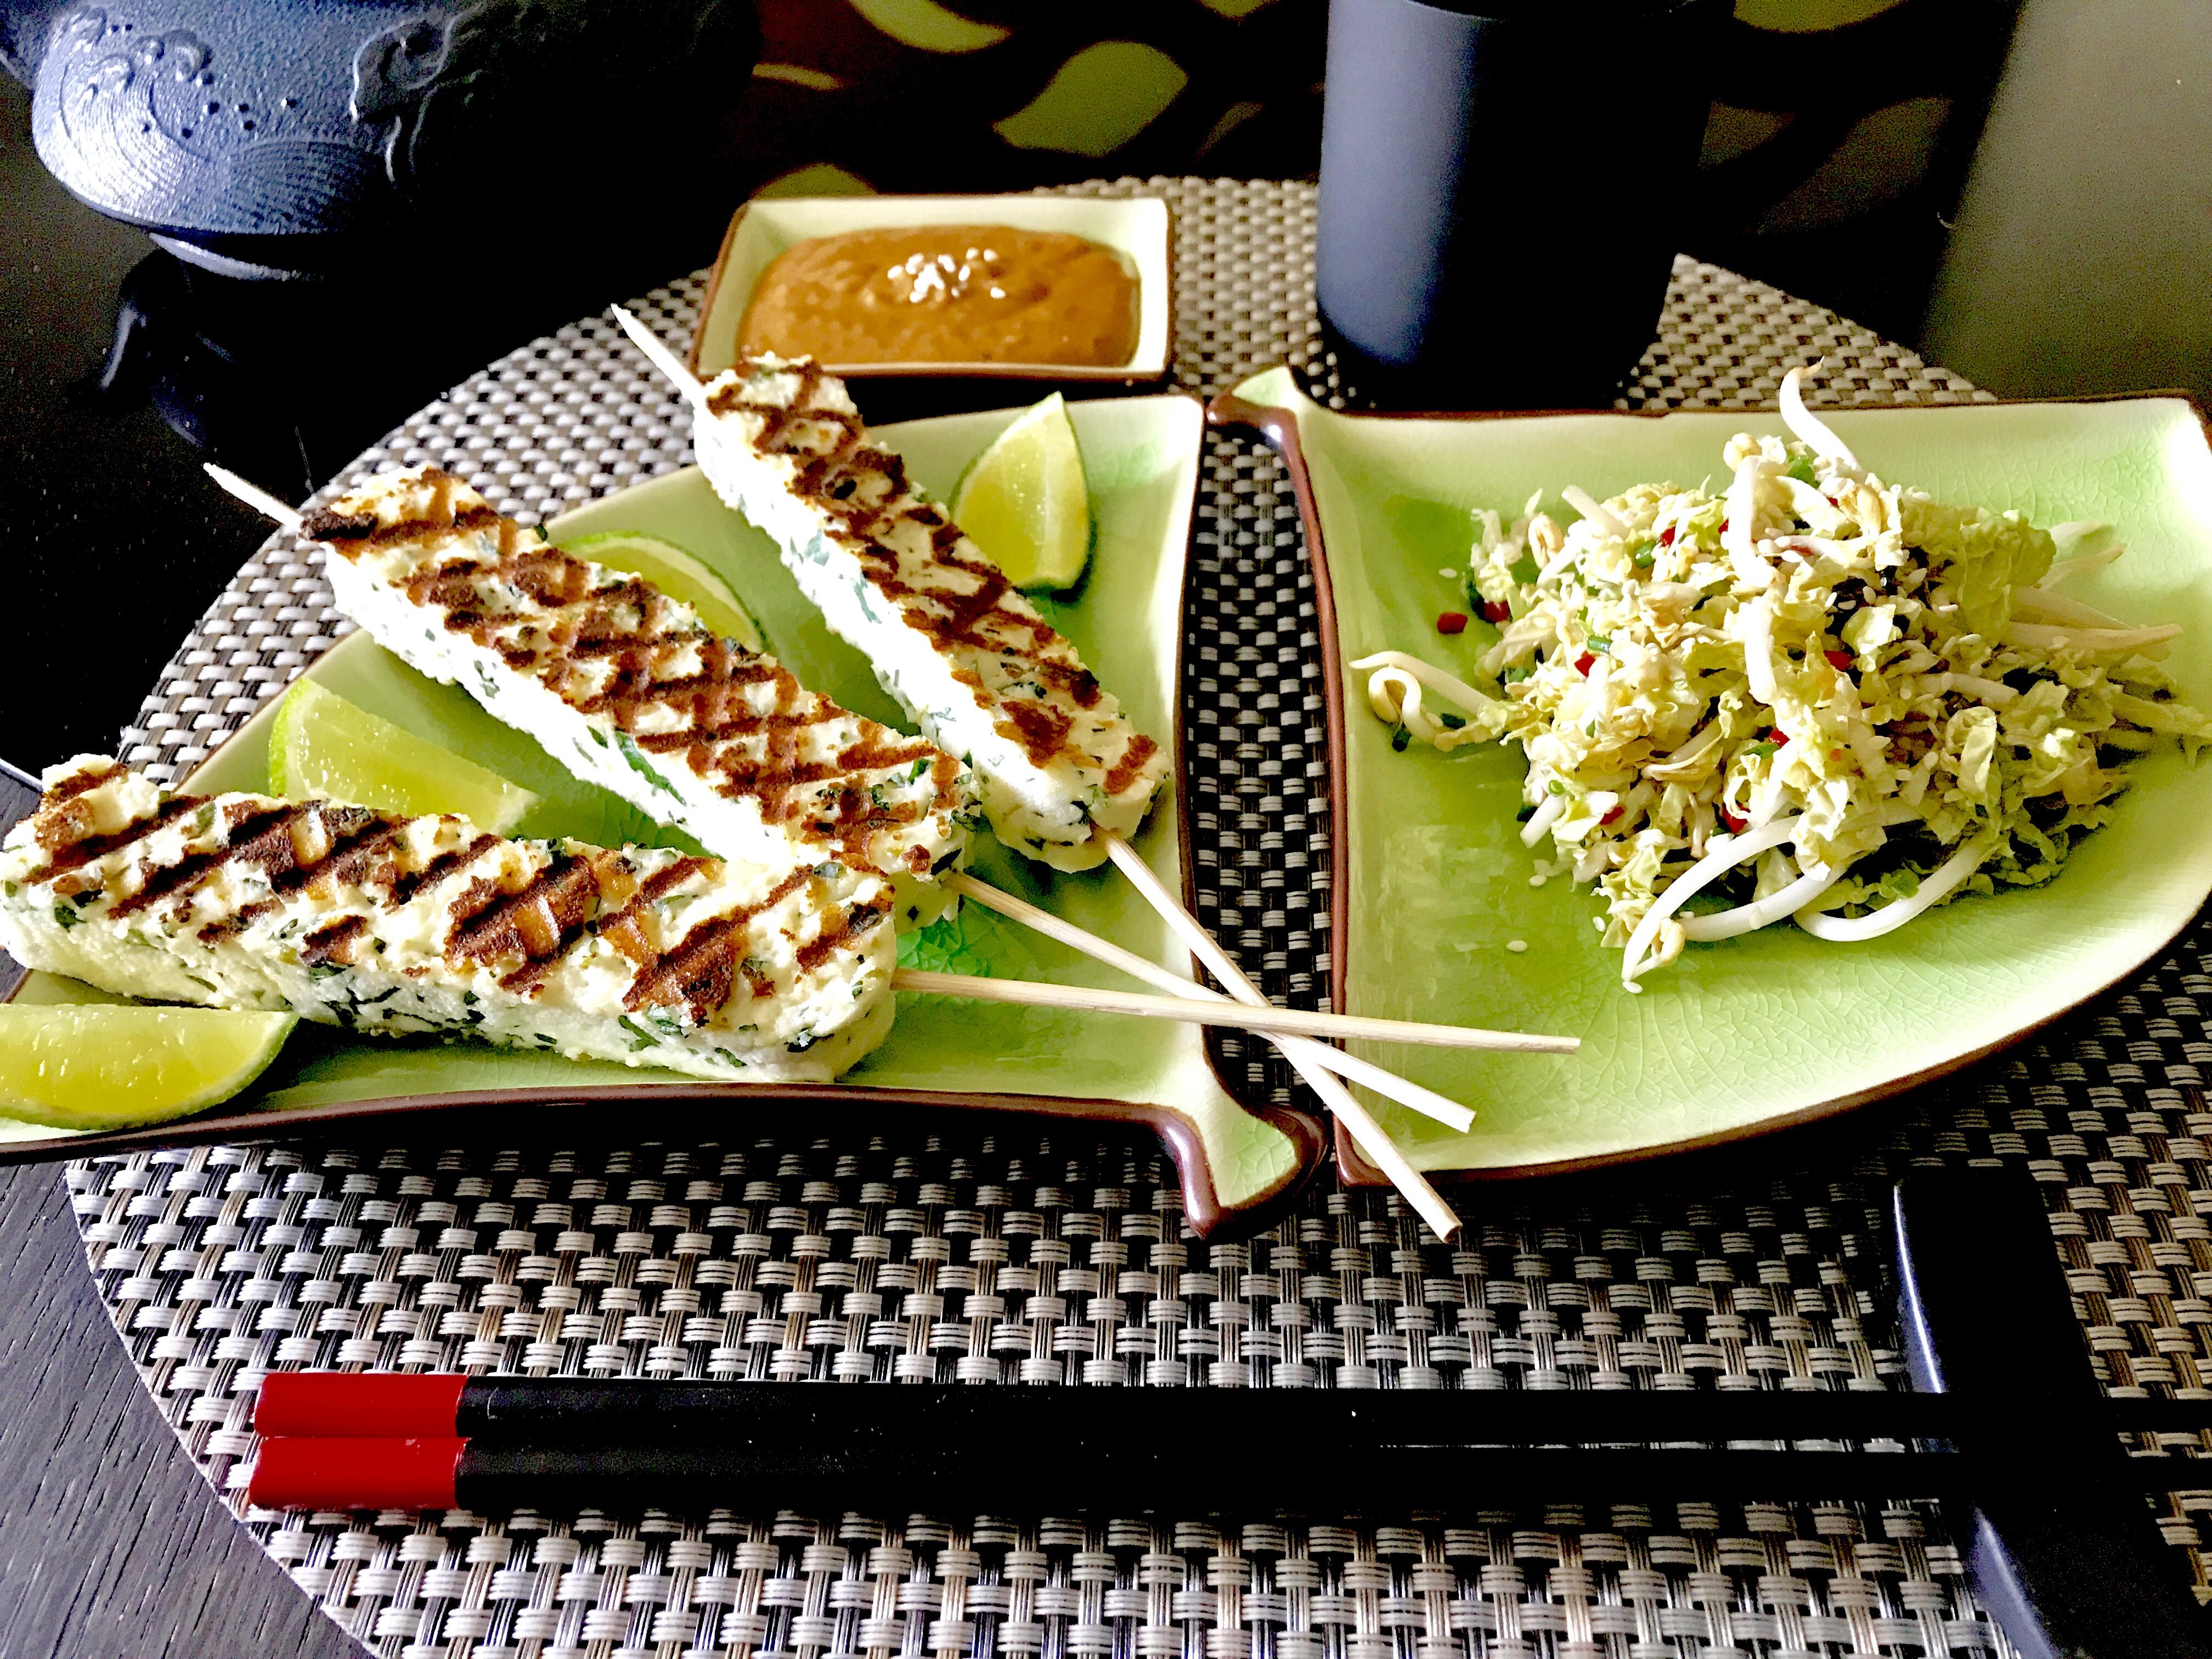 Paneer au citron vert, sauce satay et salade de choux chinois